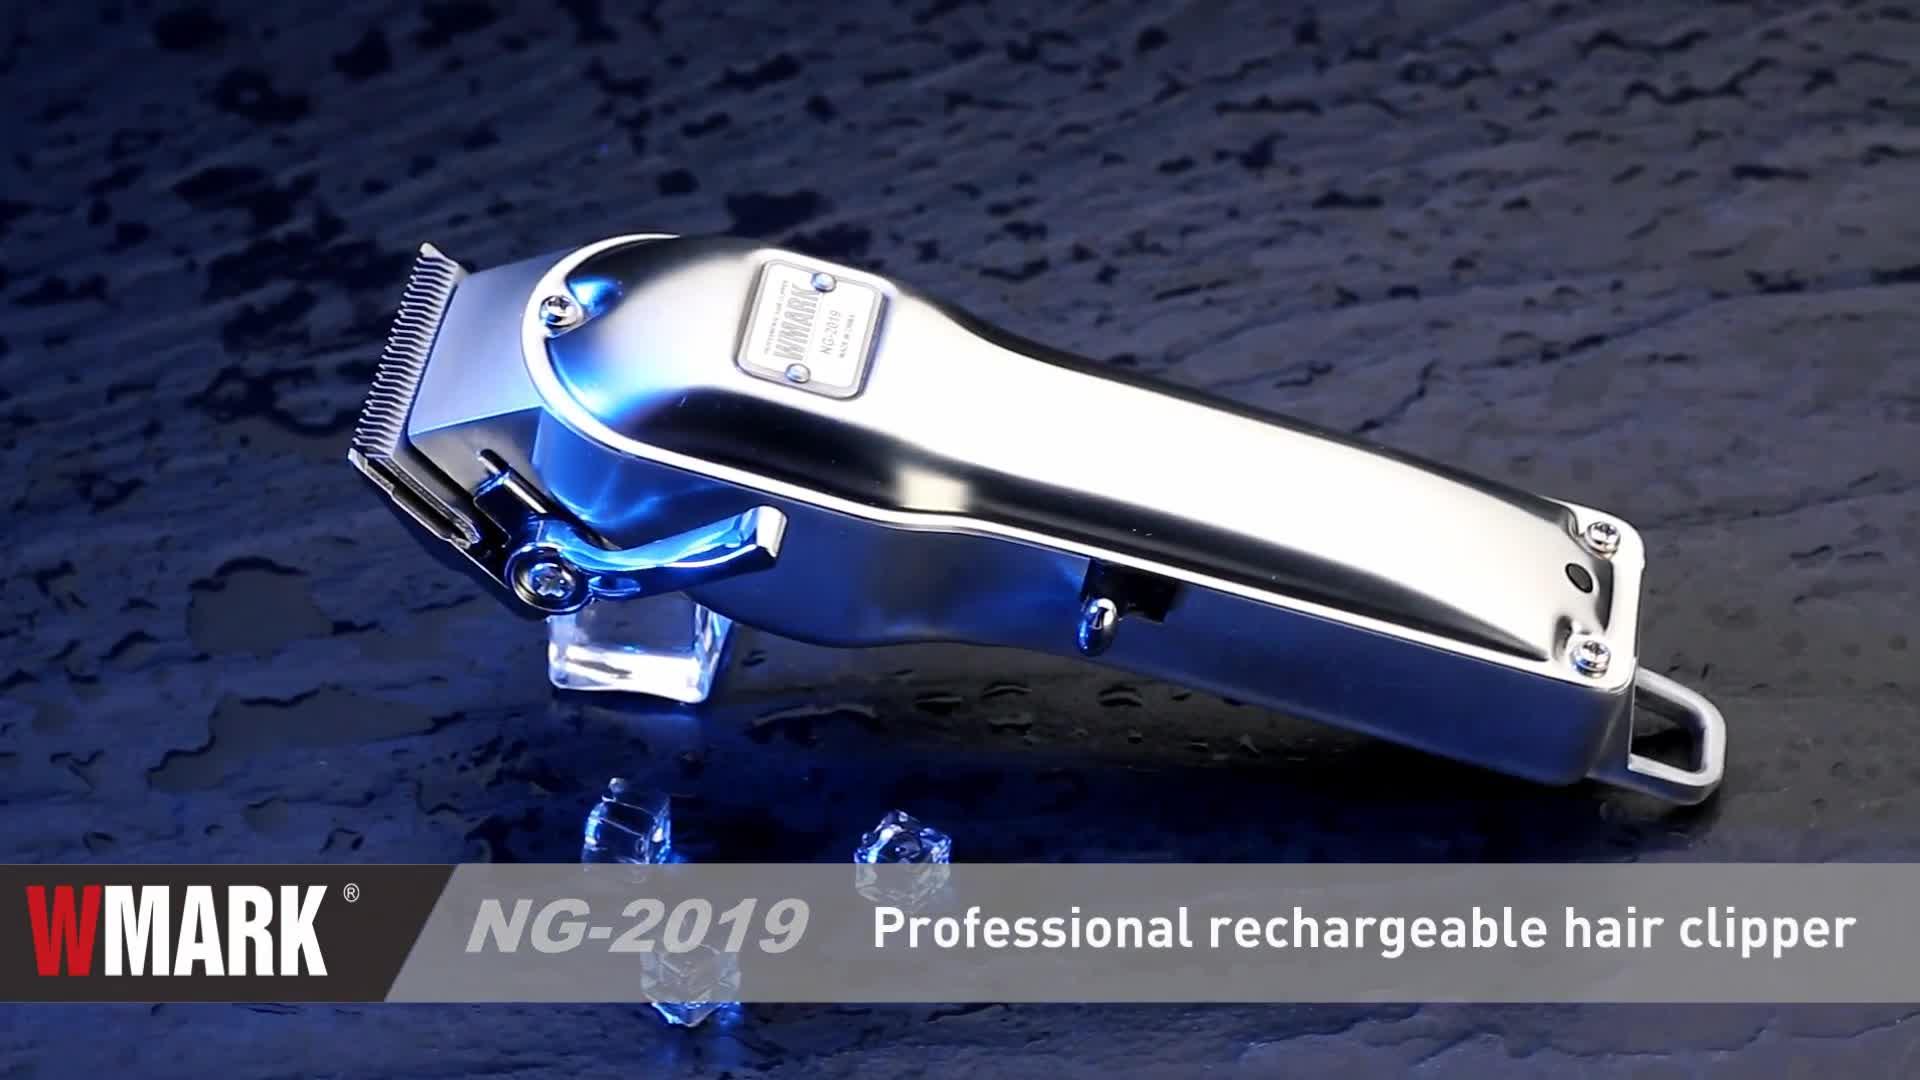 WMARK नई नाई सभी-धातु डिजाइन उच्च गुणवत्ता एलईडी प्रदर्शन बिजली के बाल क्लिपर